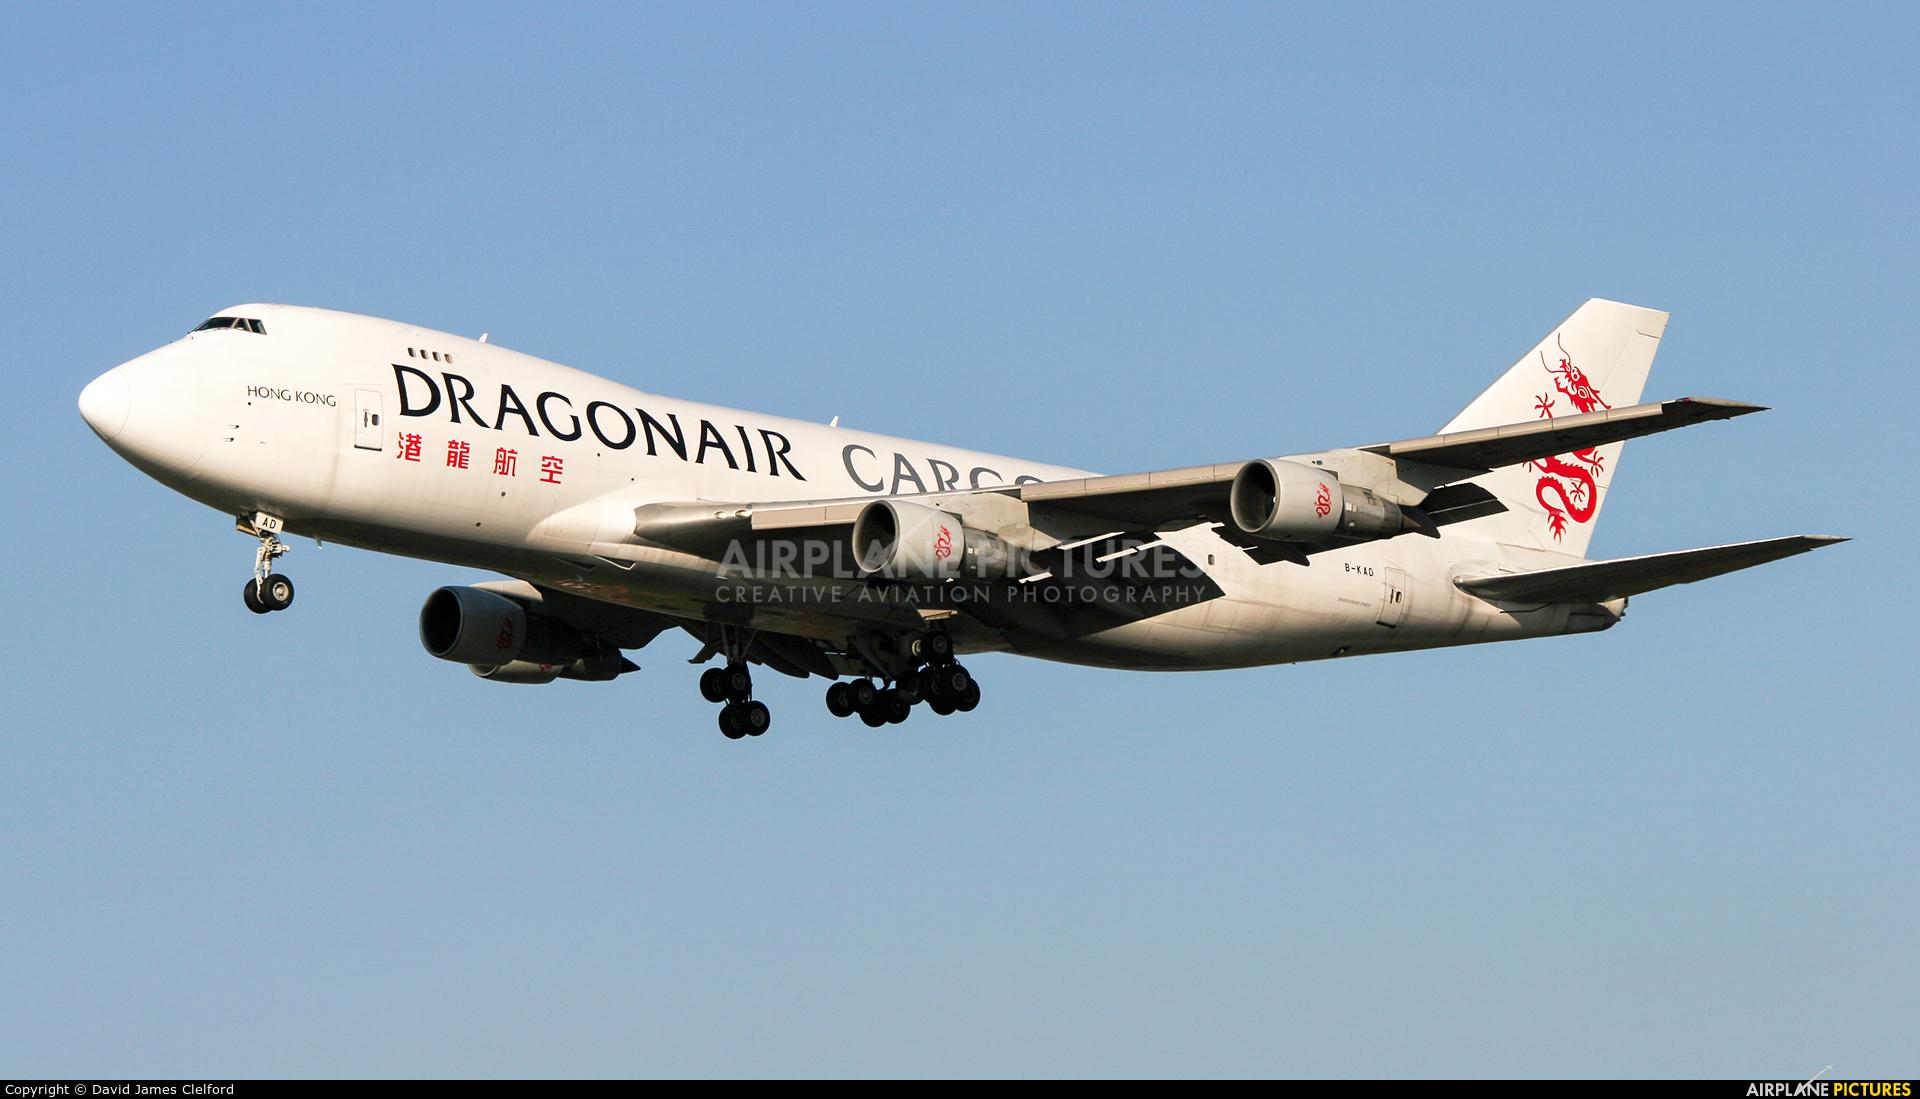 Dragonair Cargo B-KAD aircraft at Frankfurt